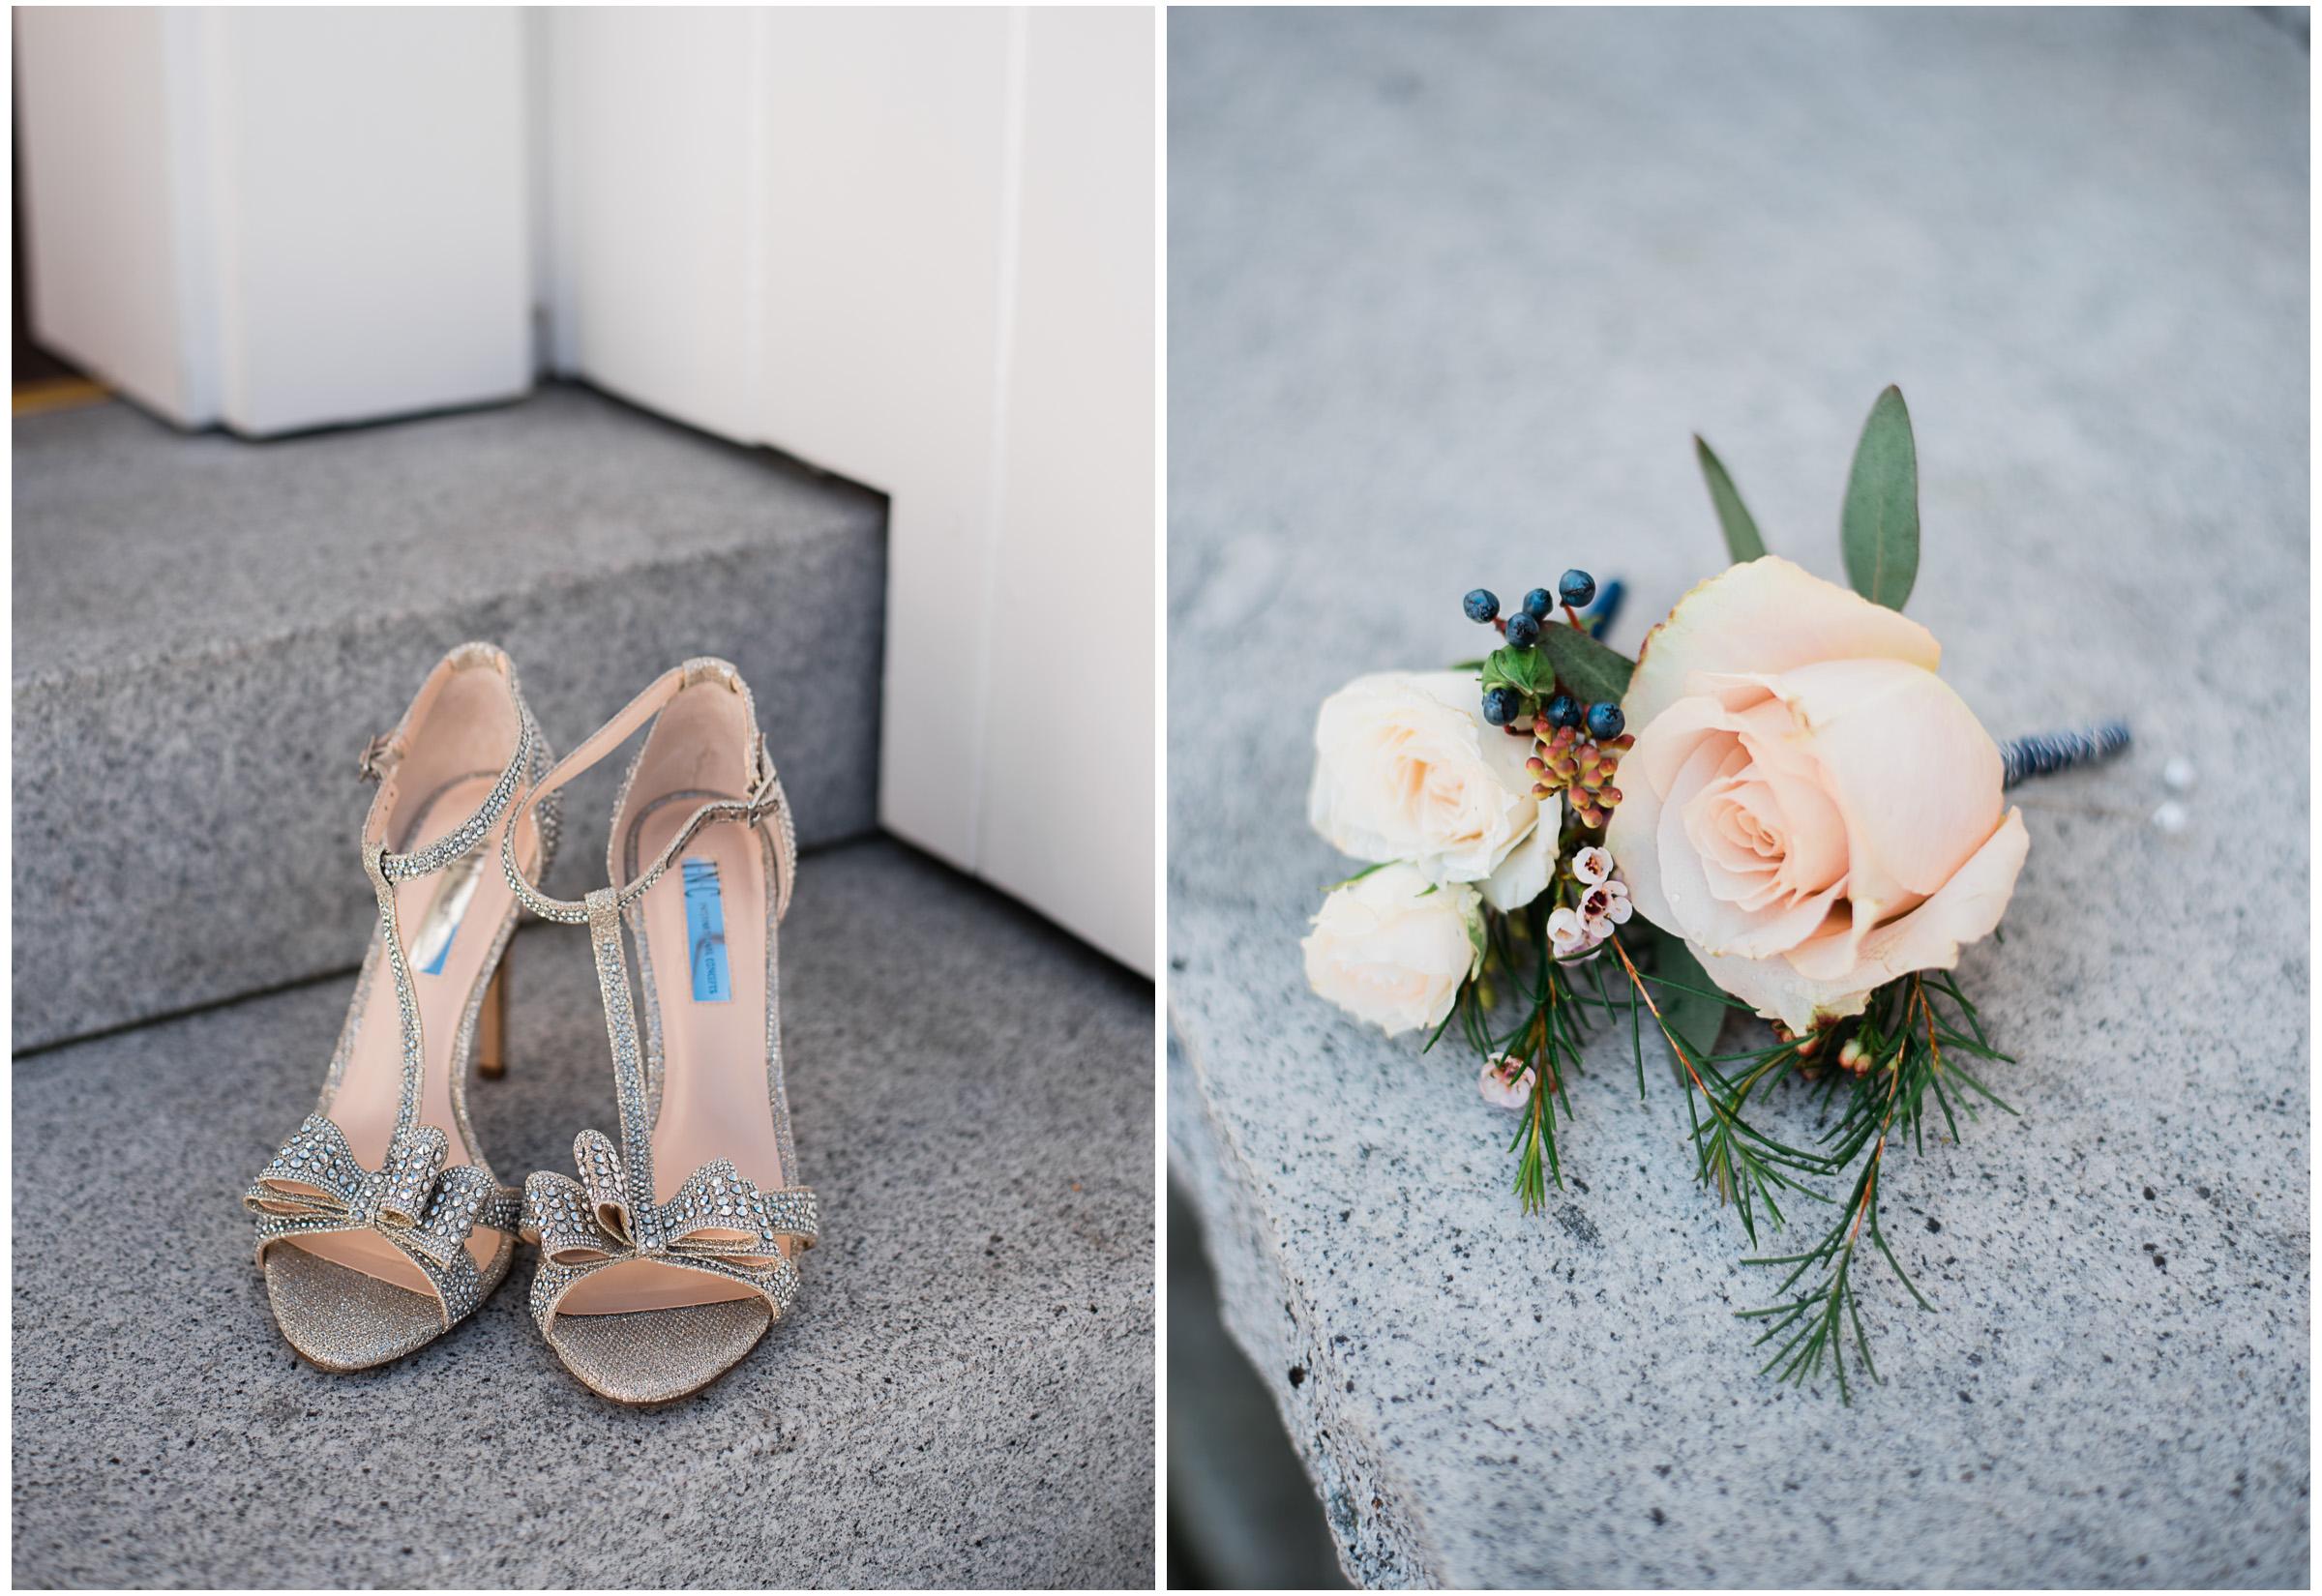 Sacramento Wedding - Sacramento Photographer - Justin Wilcox Photography - 3.jpg